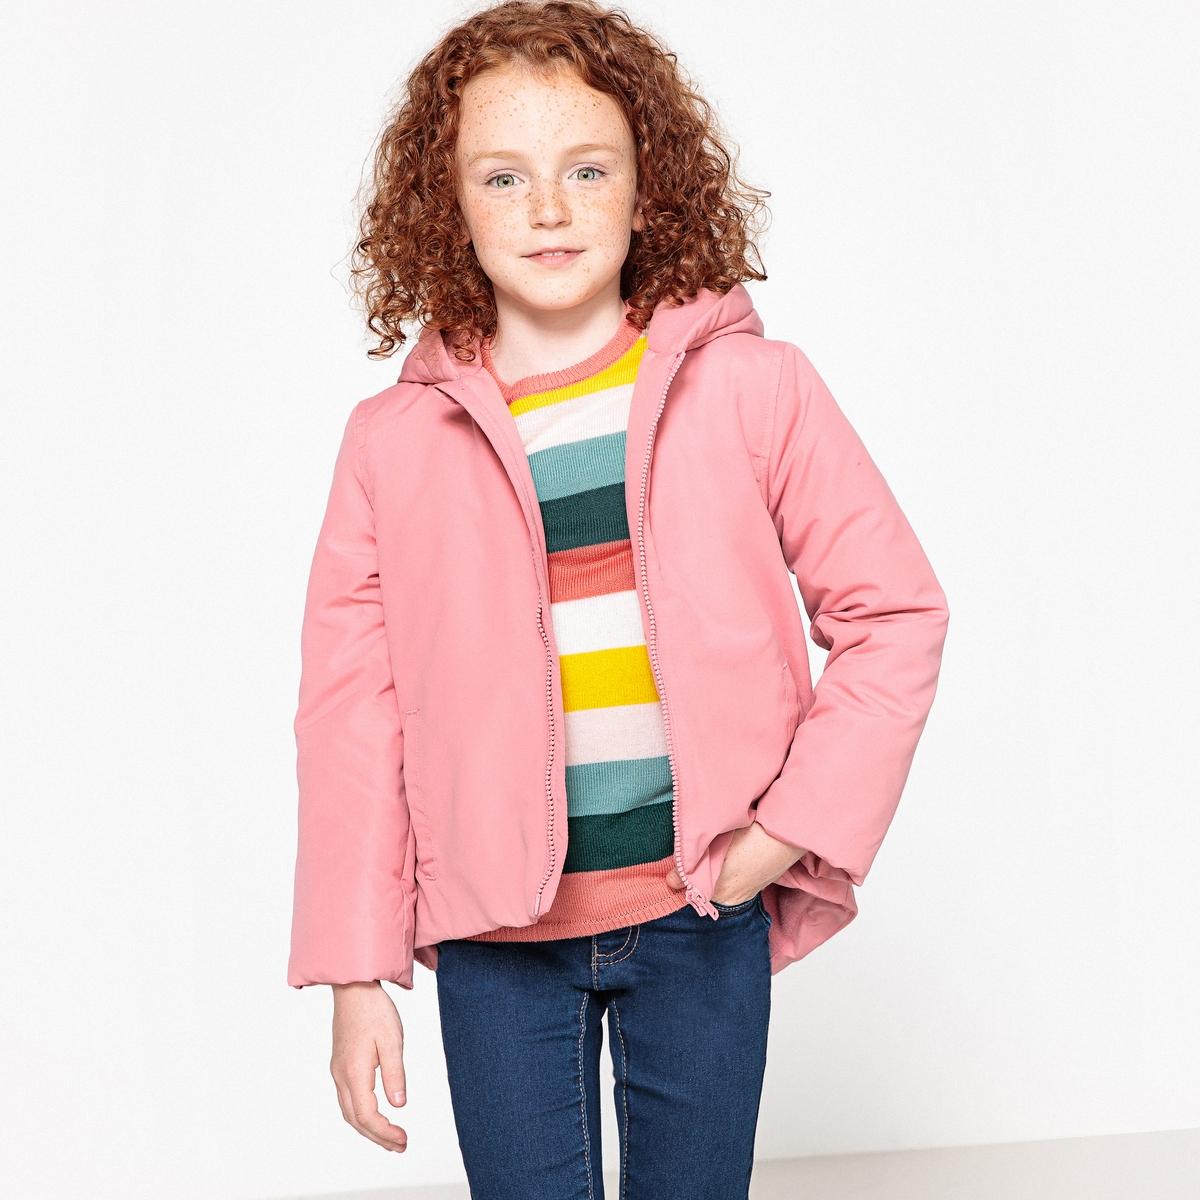 Куртка LaRedoute С капюшоном 3-12 лет 3 года - 94 см розовый парка la redoute с капюшоном 3 года 94 см зеленый